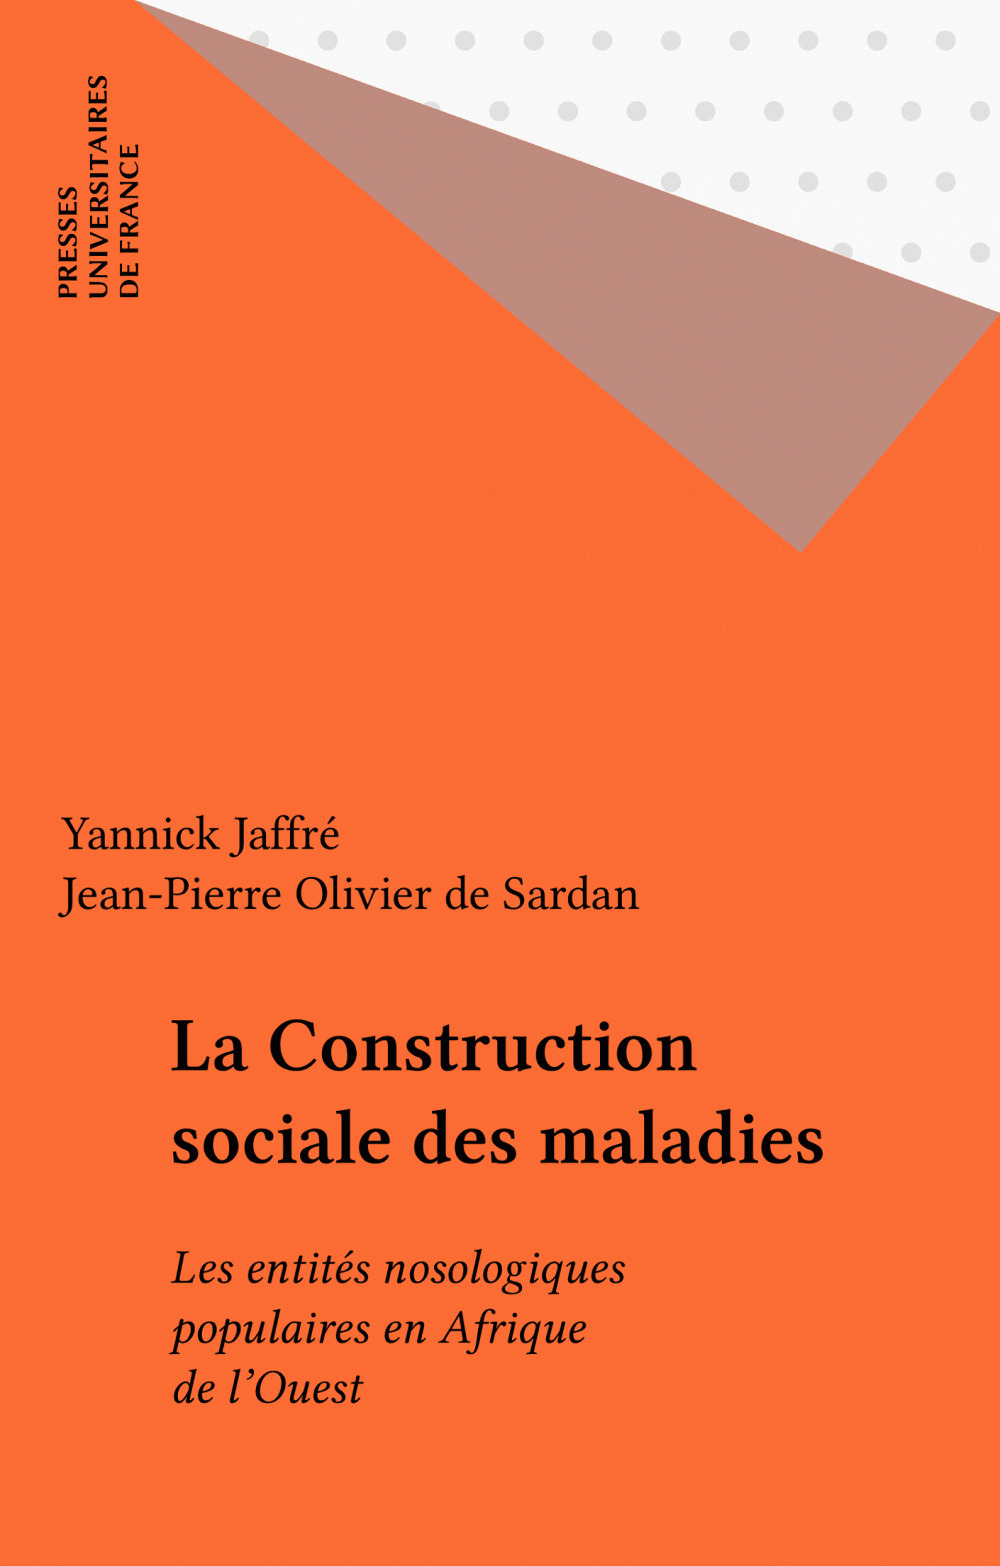 La Construction sociale des maladies